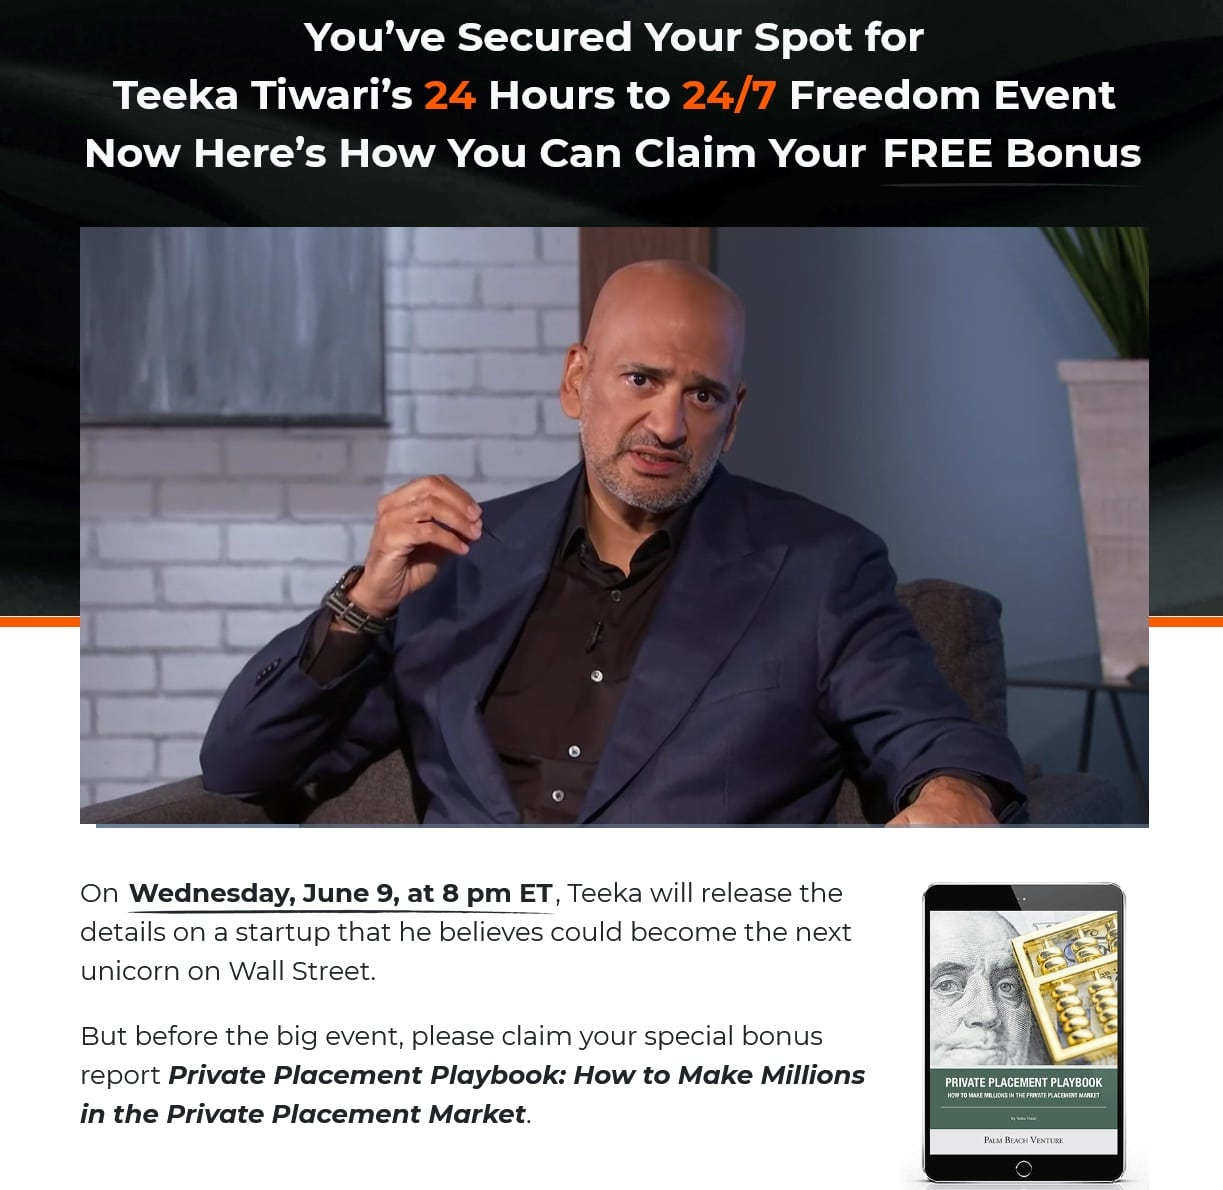 24 Hours to 24-7 Freedom with Teeka Tiwari